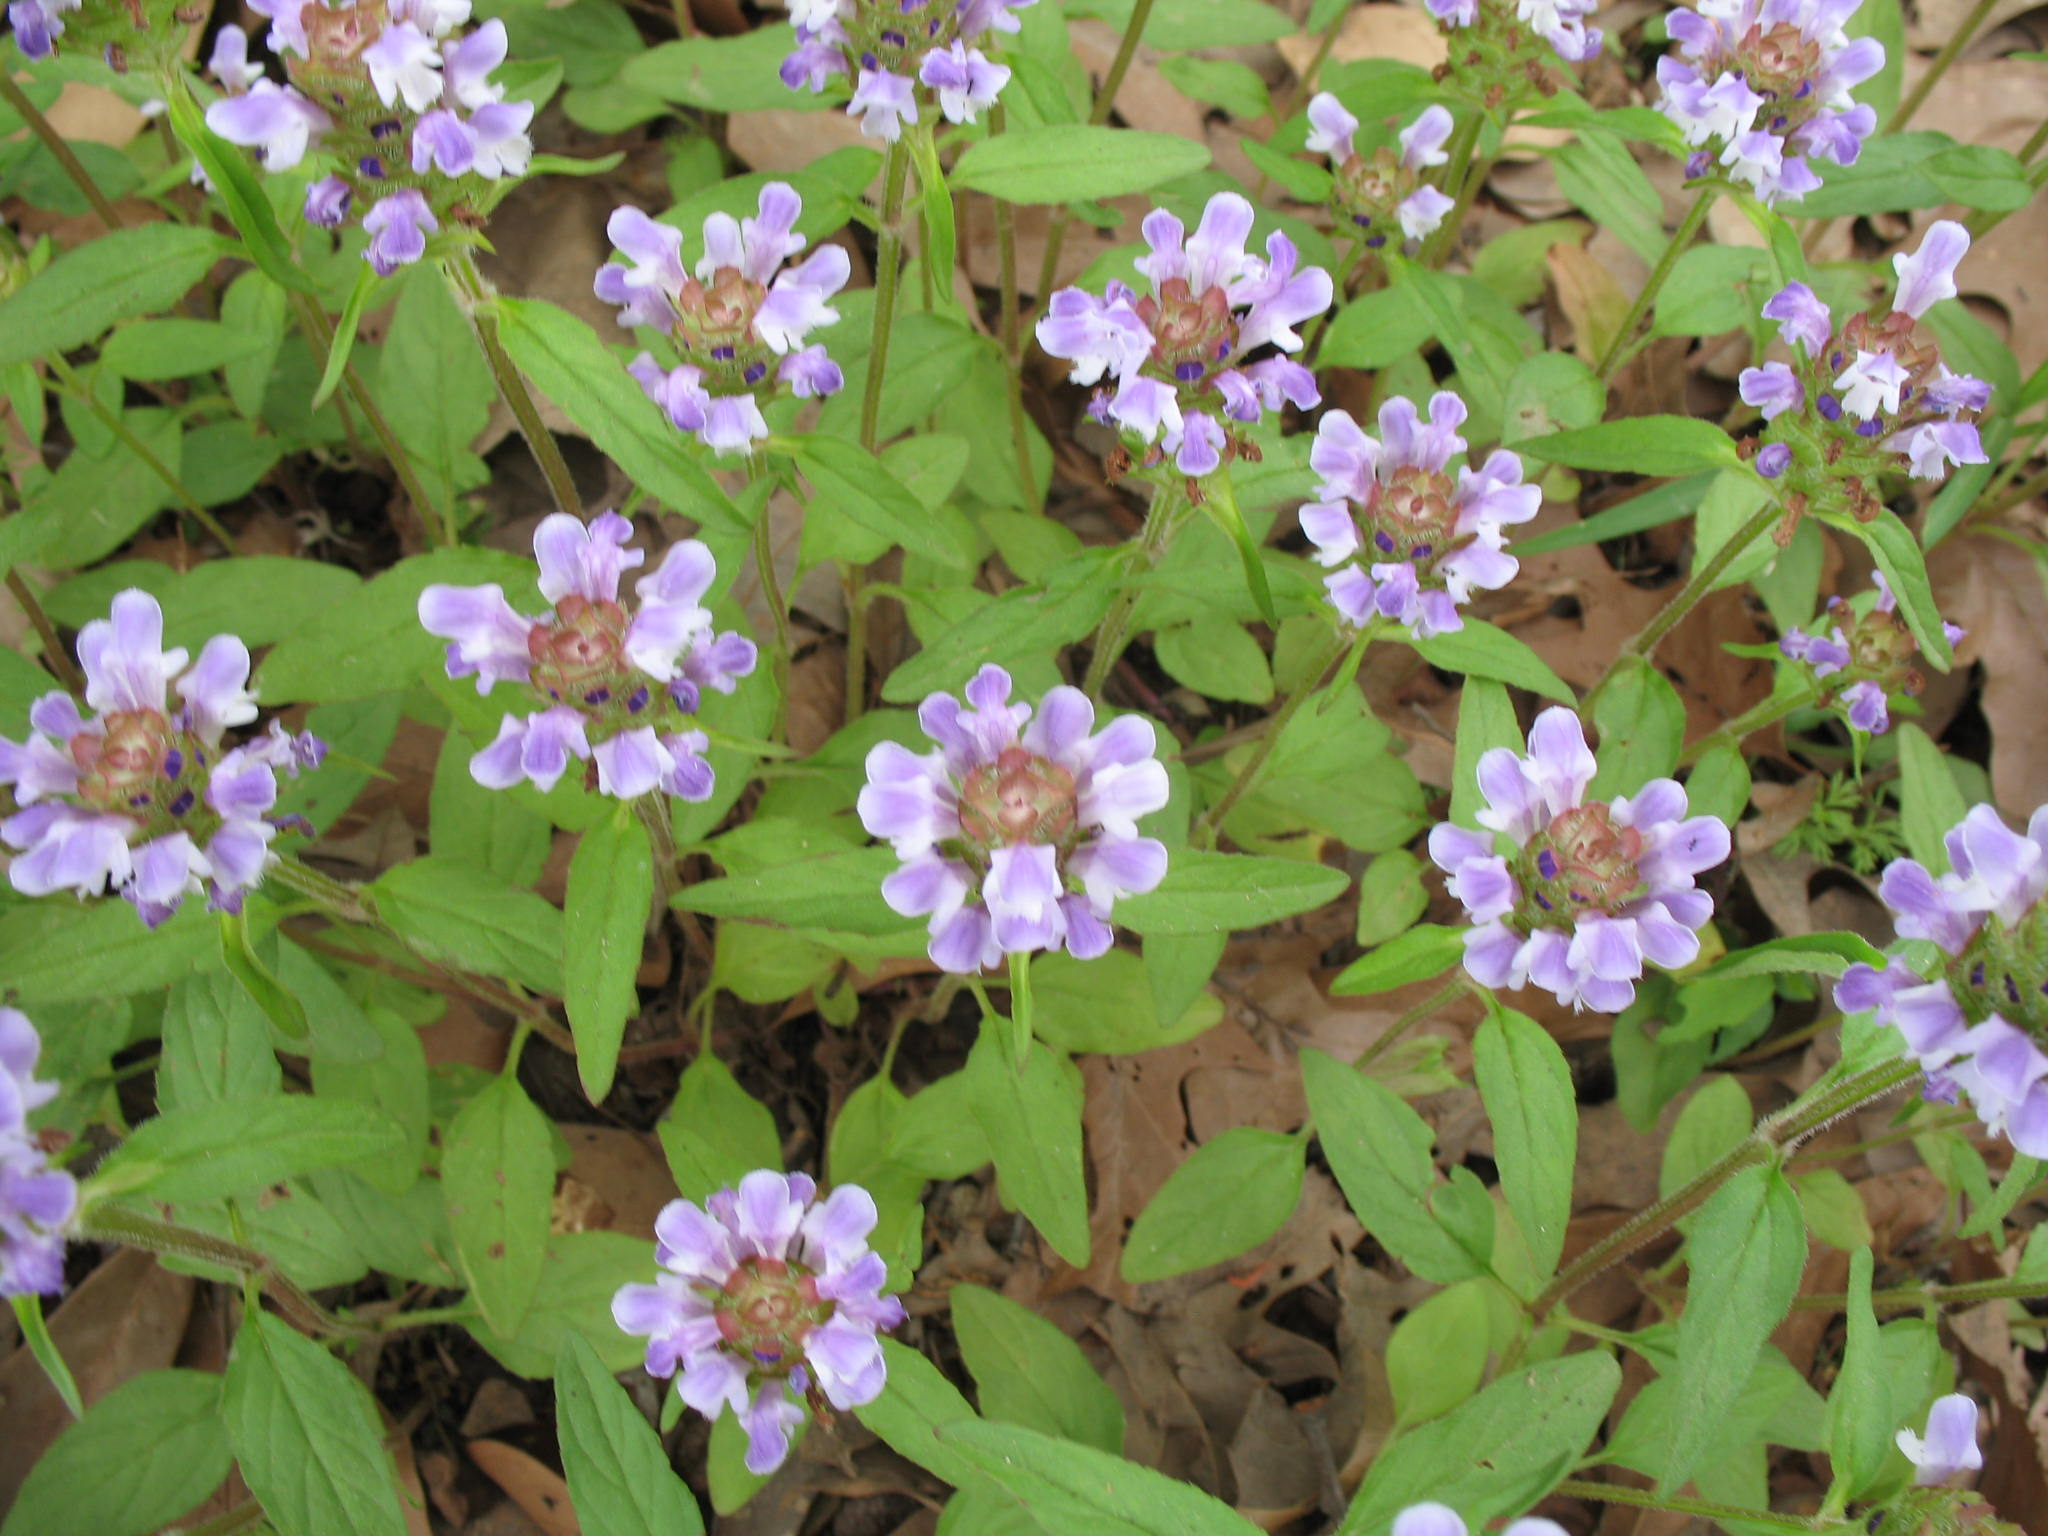 Prunella vulgaris / Prunella vulgaris